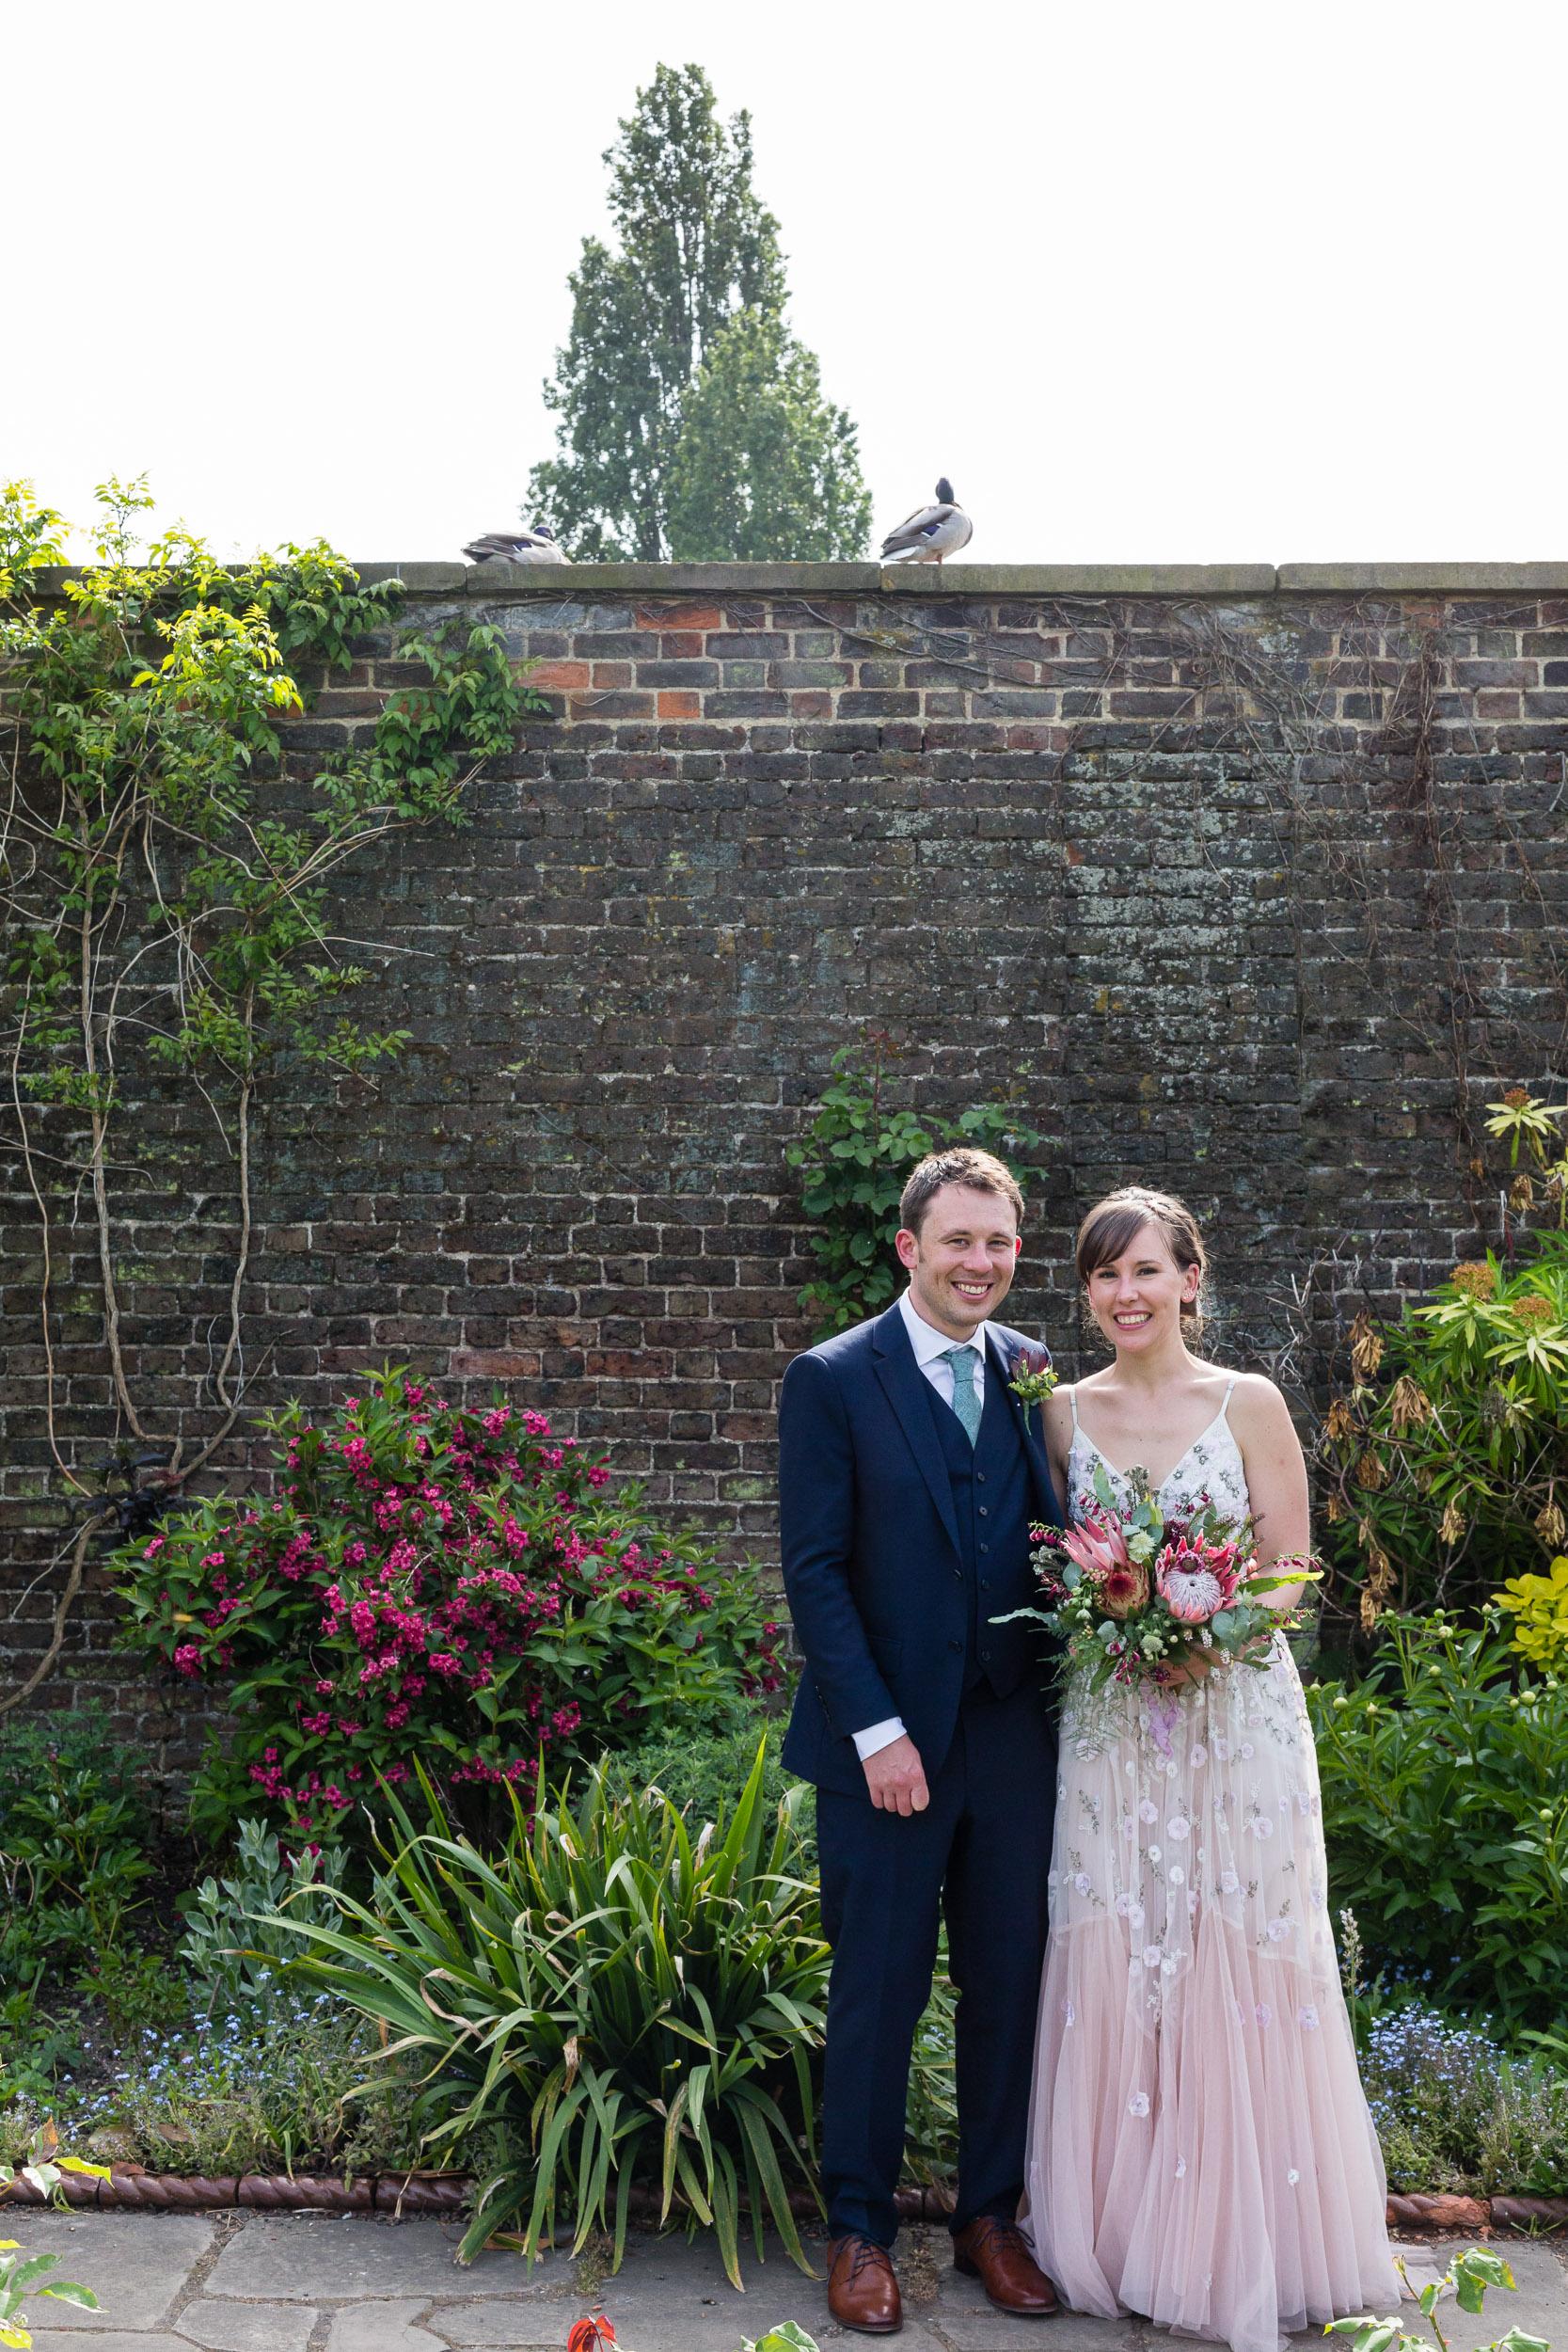 brockwell-lido-brixton-herne-hill-wedding-270.jpg